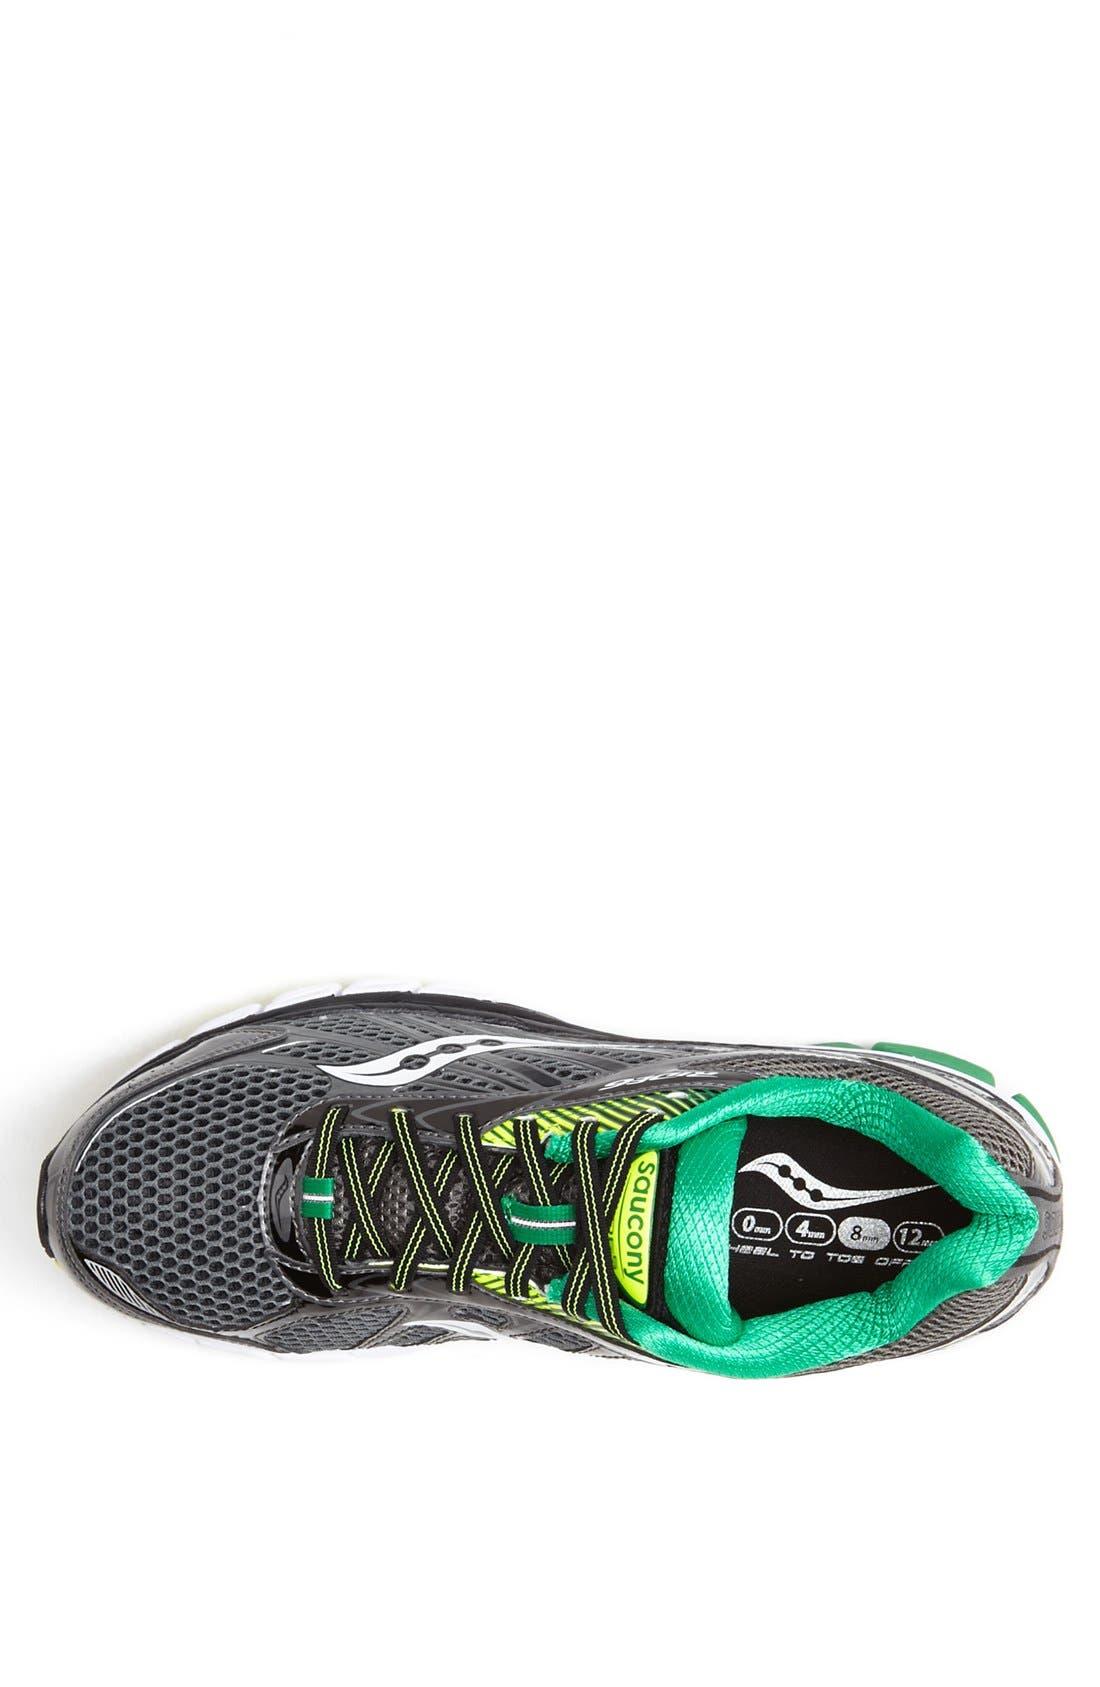 Alternate Image 3  - Saucony 'Ride 6' Running Shoe (Men)